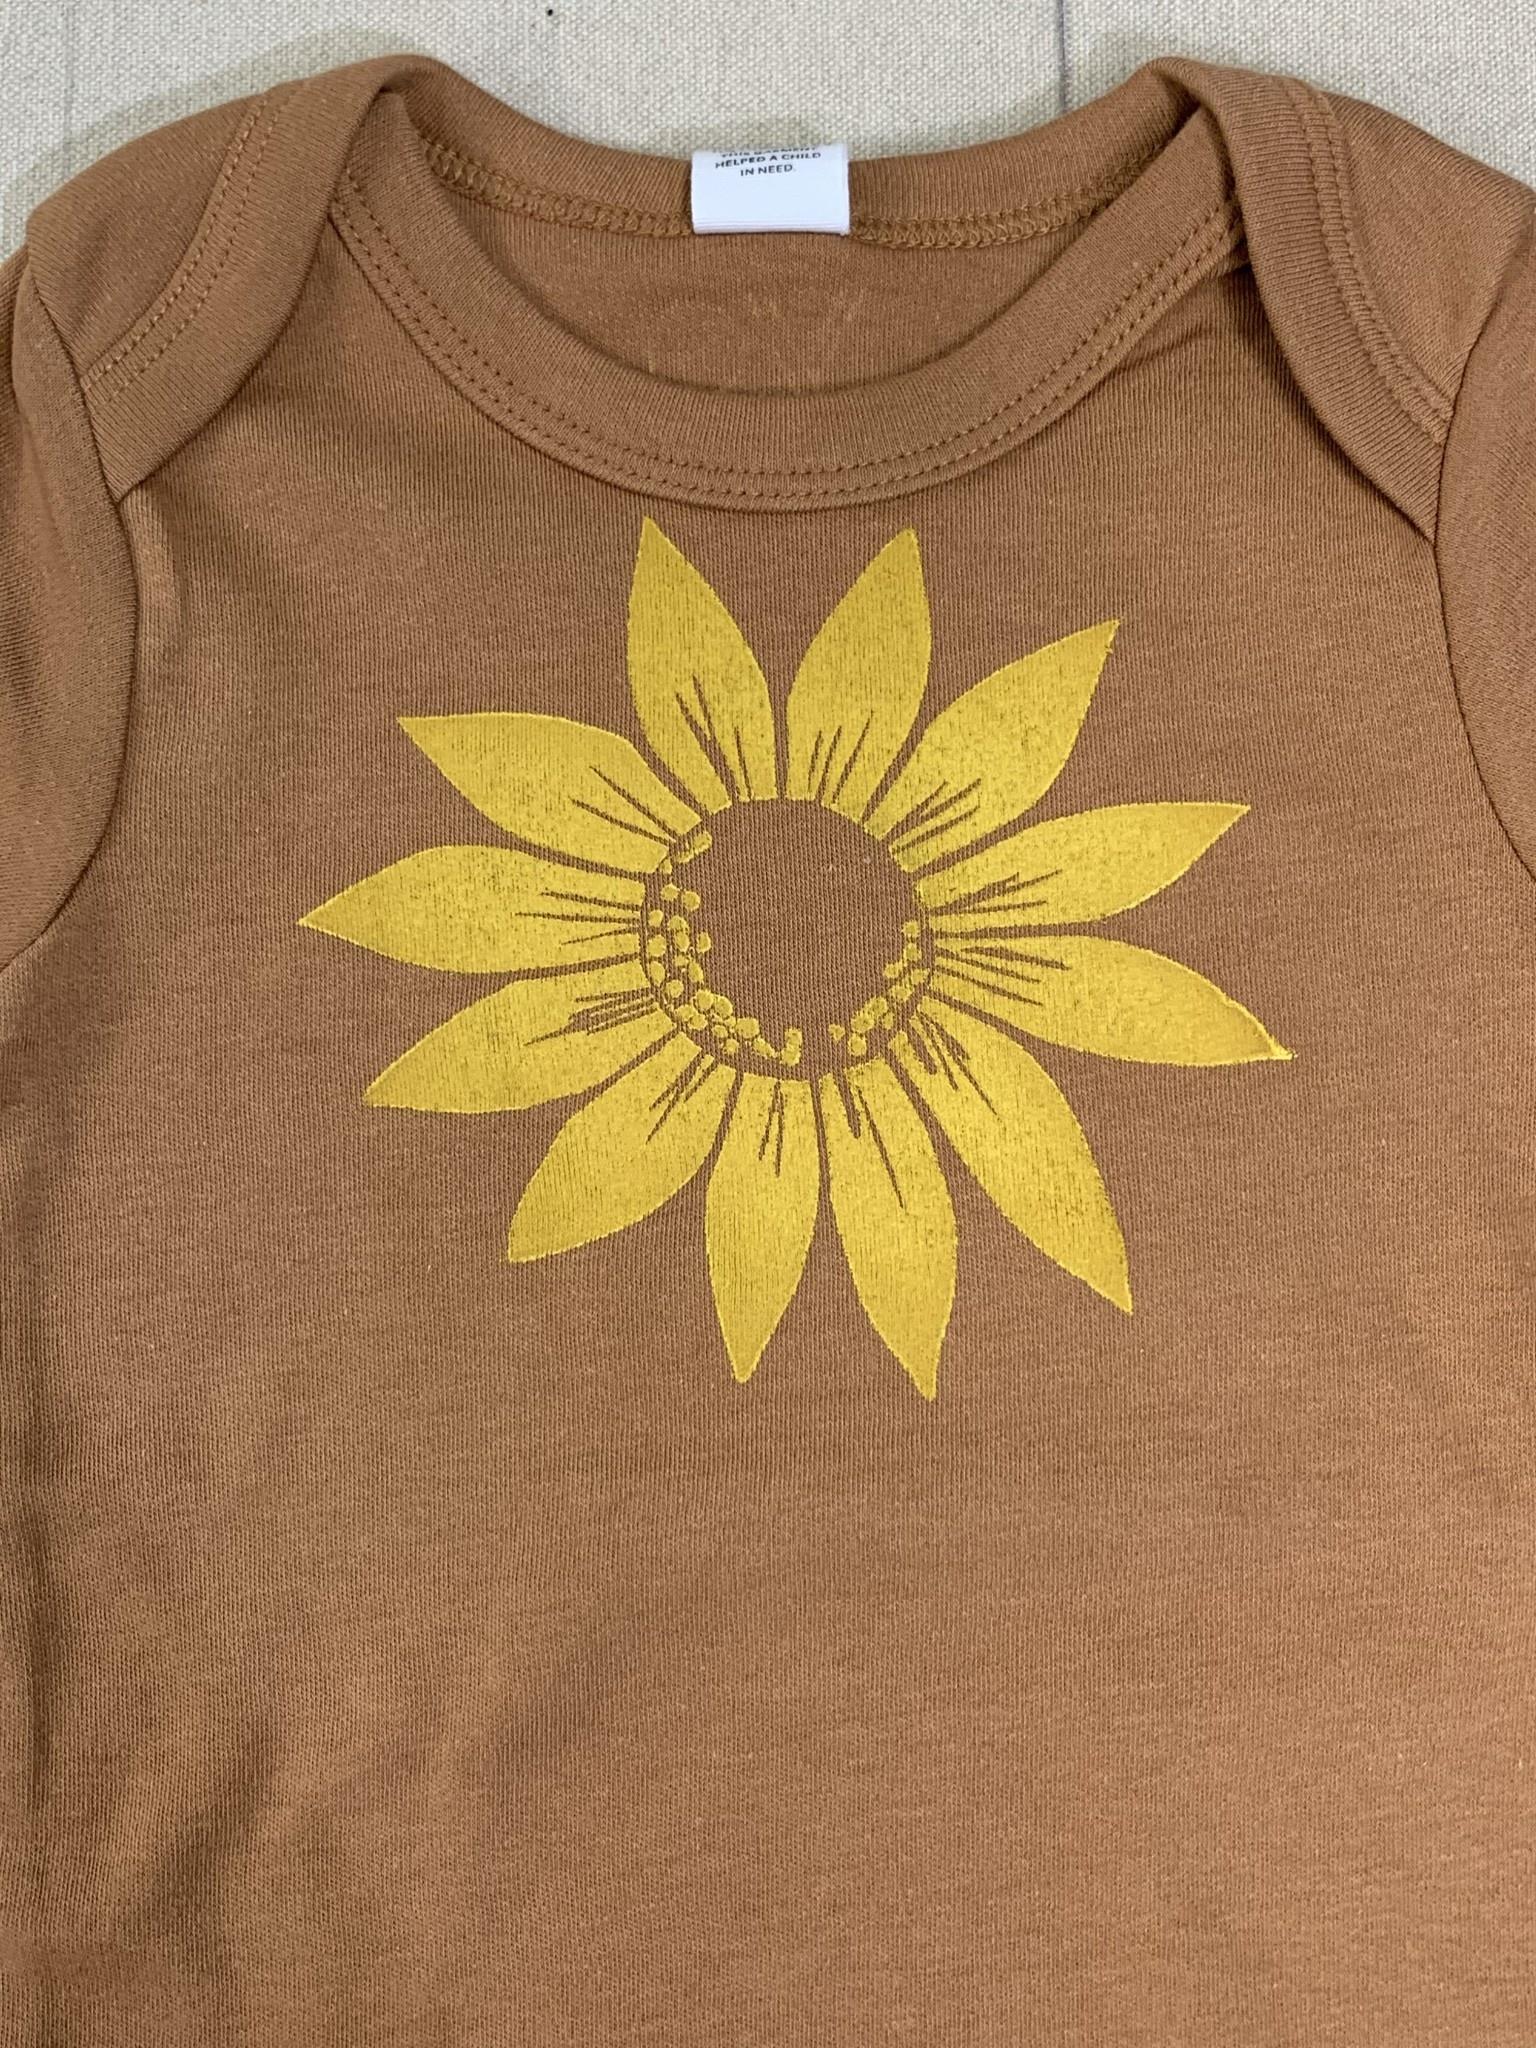 Vickery Ottaway Design Vickery Ottoway Sunflower Onsie